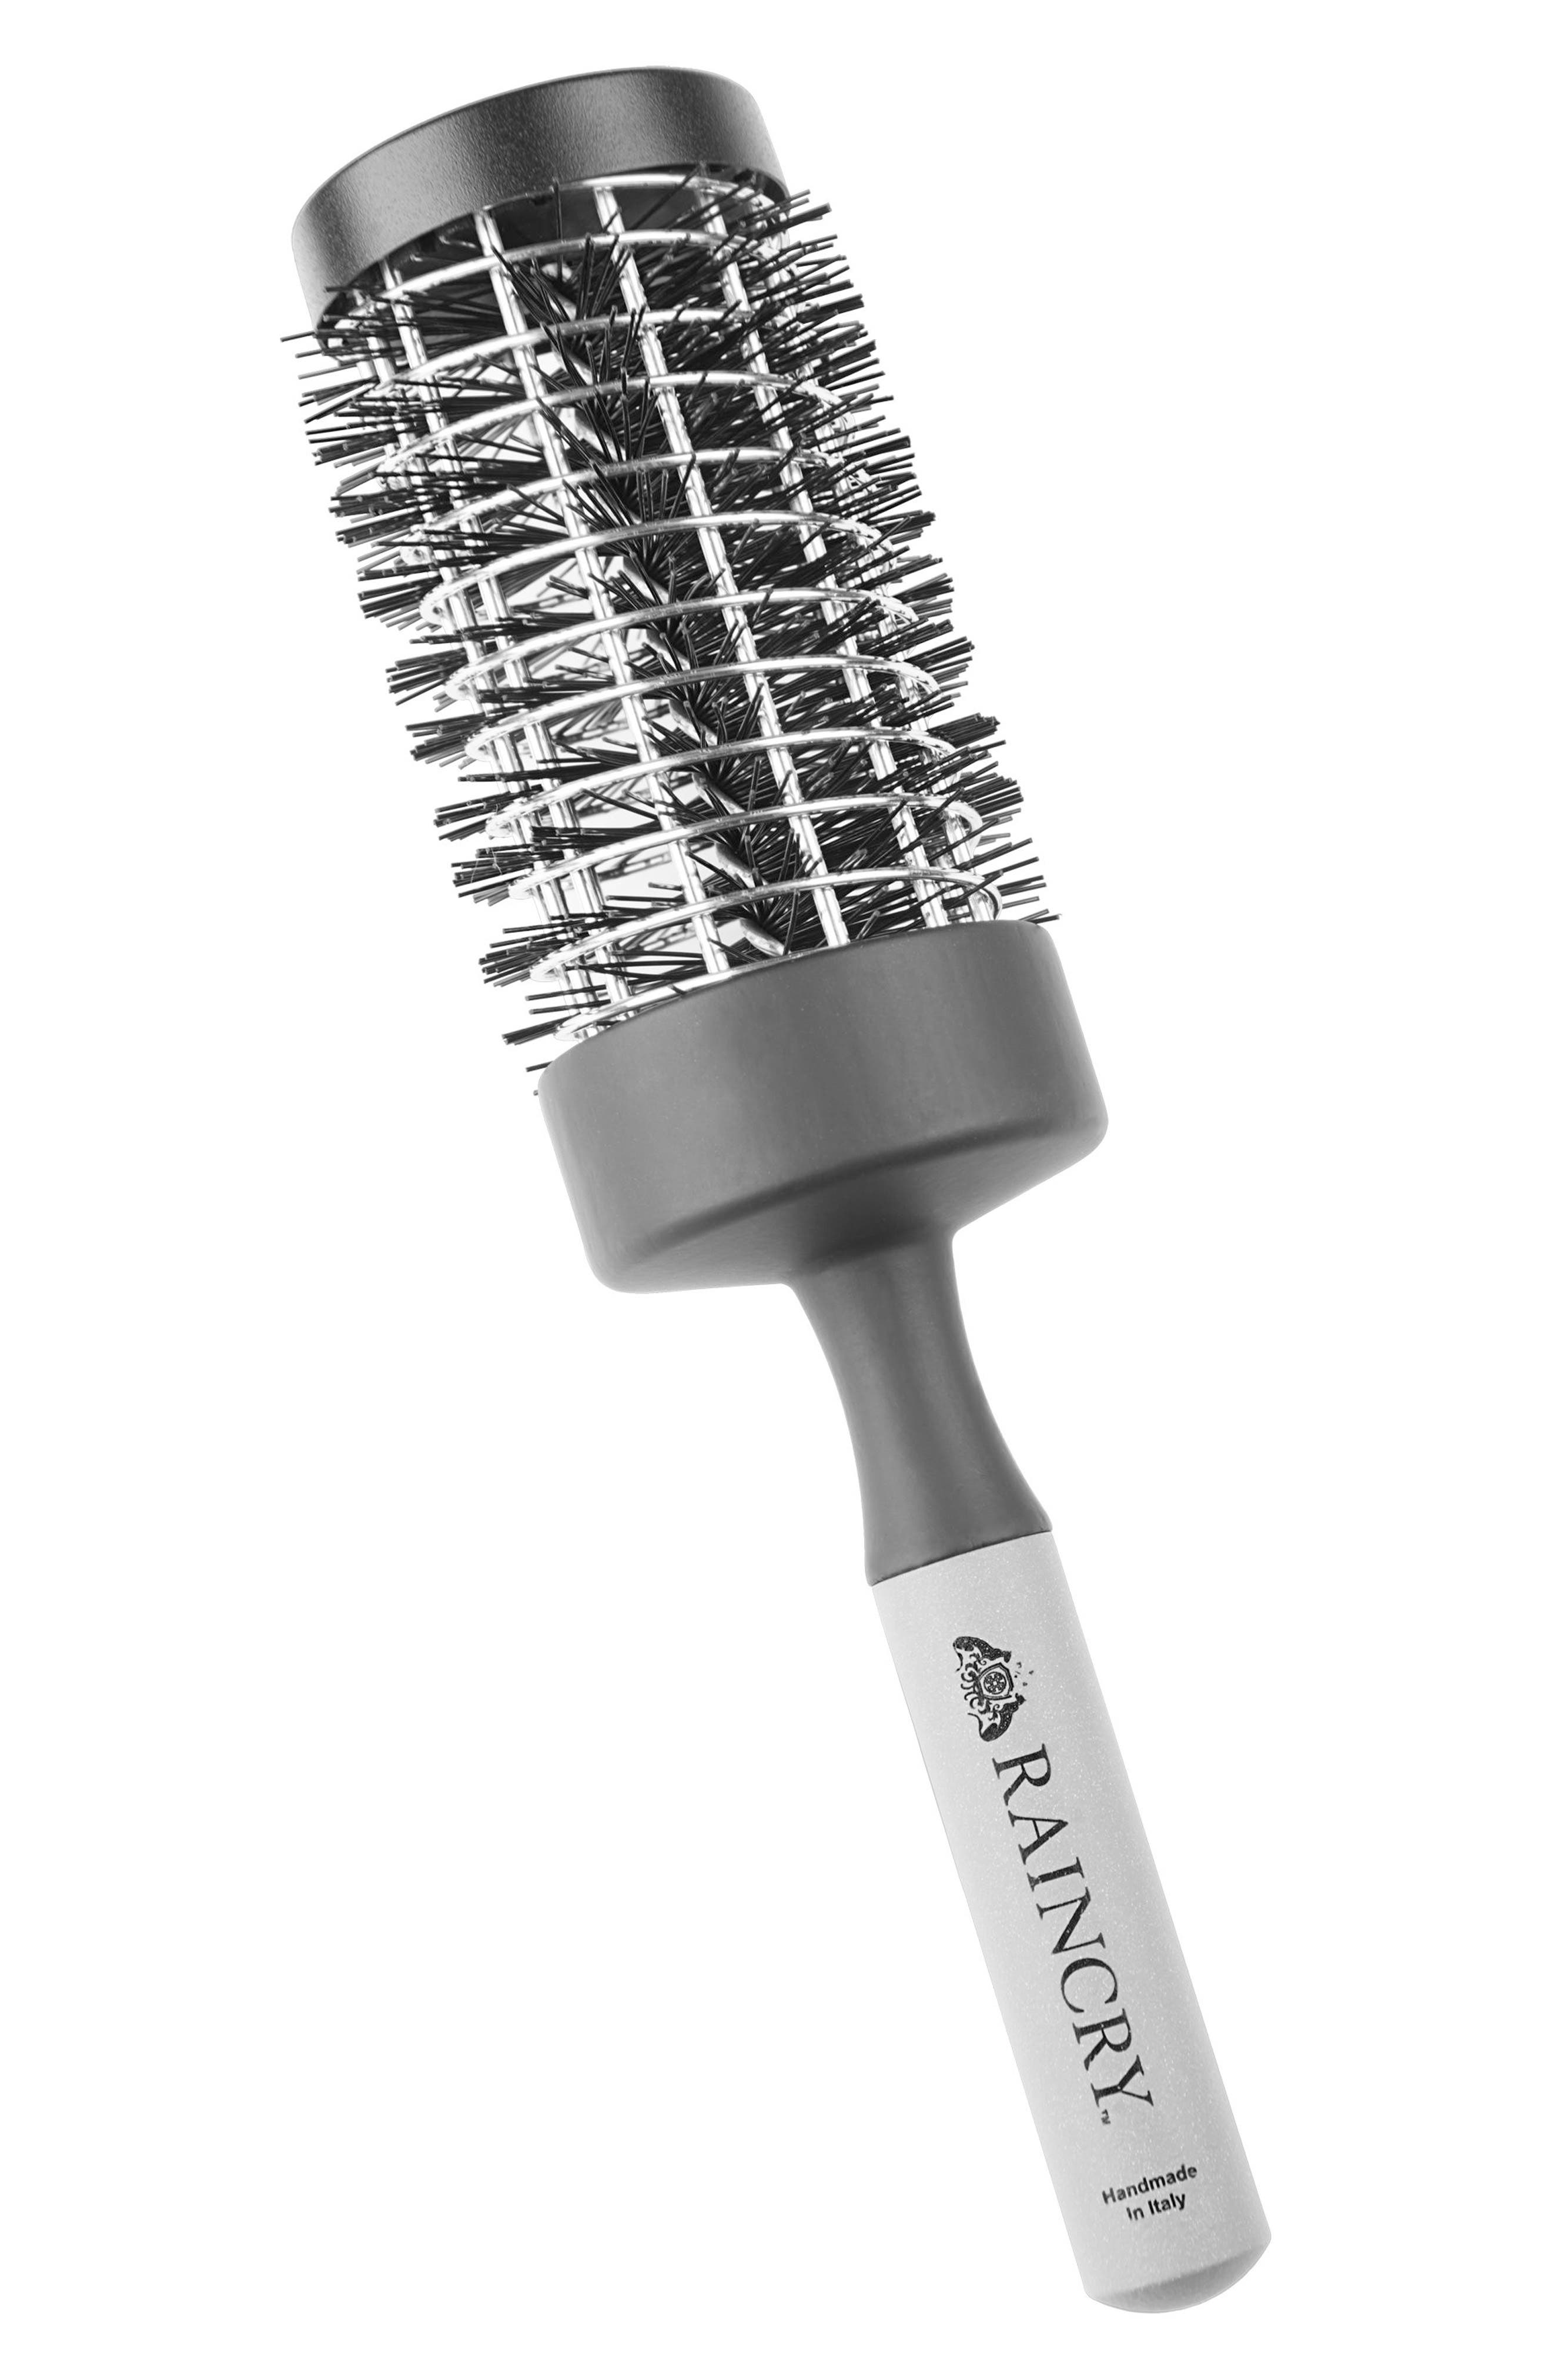 RAINCRY Volume Plus Magnesium Volumizing Brush in Charcoal